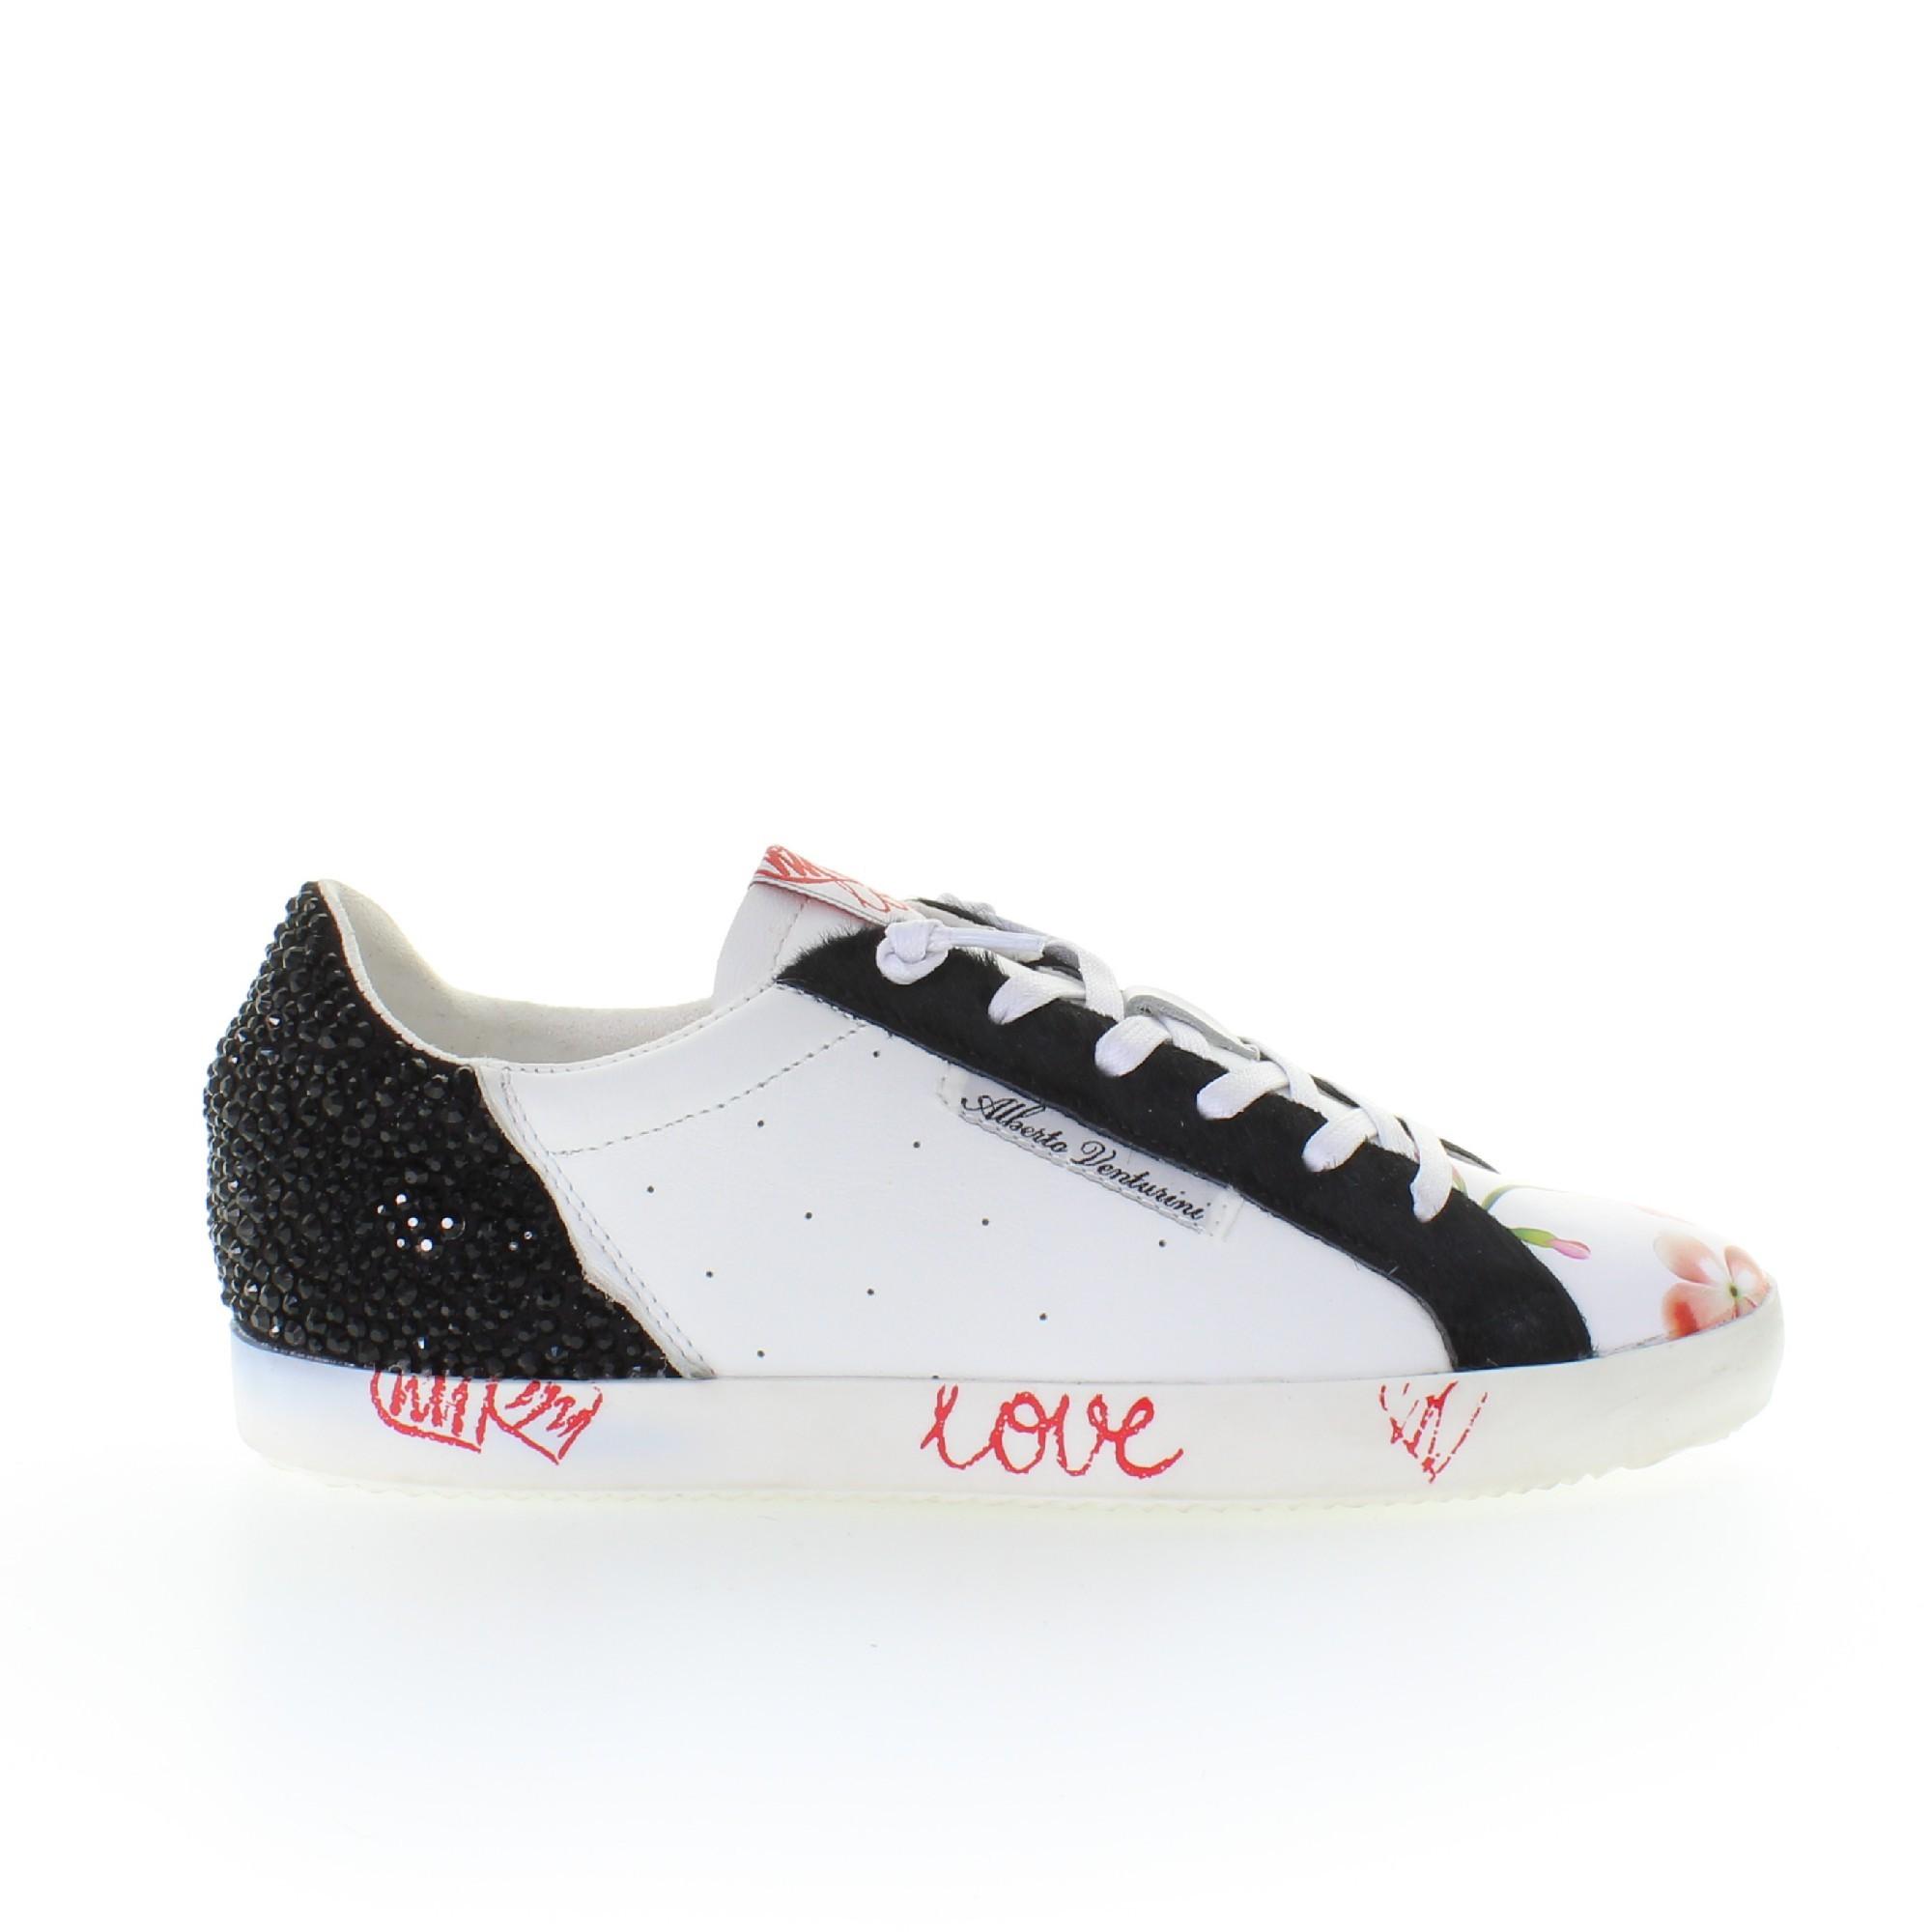 Love'' Love'' ''pure Schwarze Schwarze ''pure ''pure Sneaker Love'' Schwarze Sneaker Sneaker KcTF1Jl3u